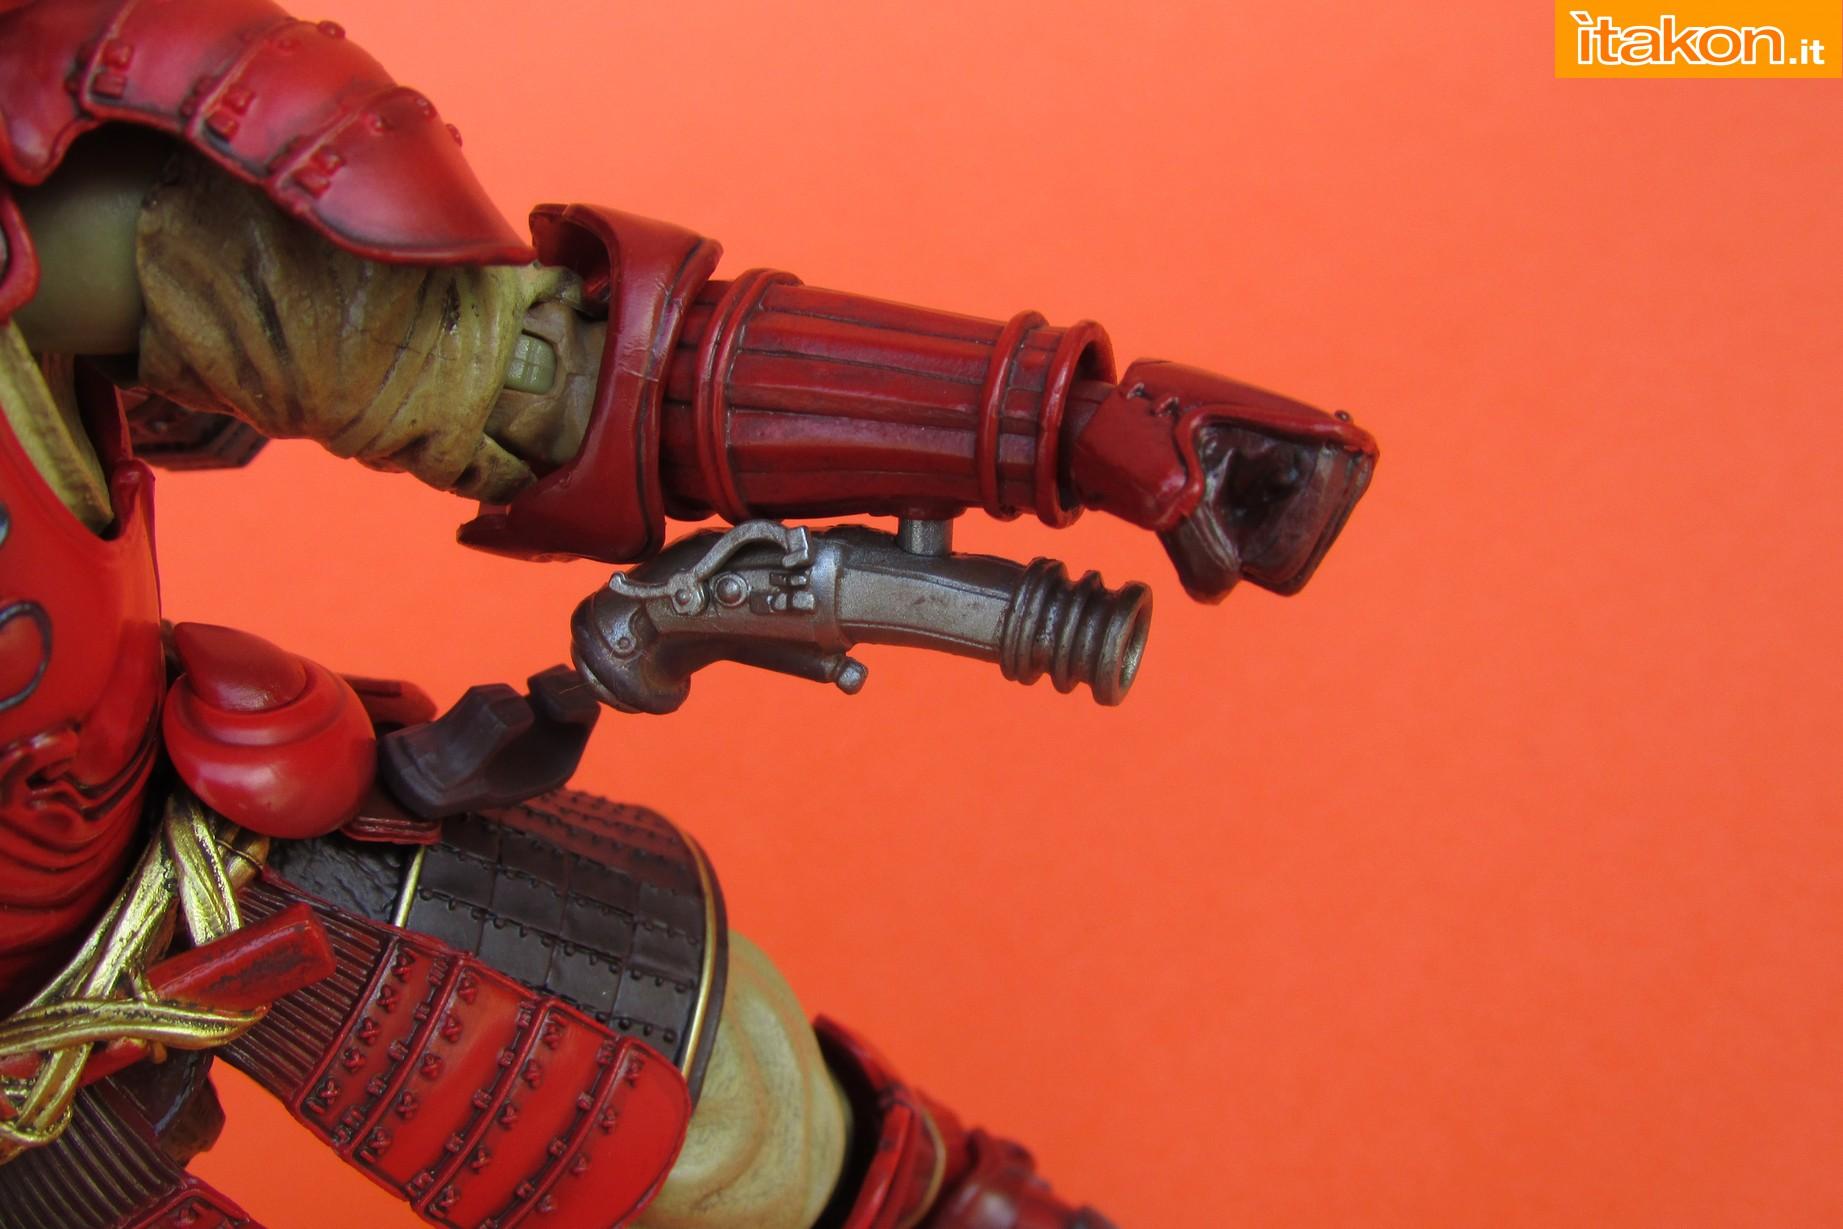 Link a Marvel Comics Koutetsu Samurai Iron Man Mark 3 Meishou MANGA REALIZATION review Bandai Itakon.it43